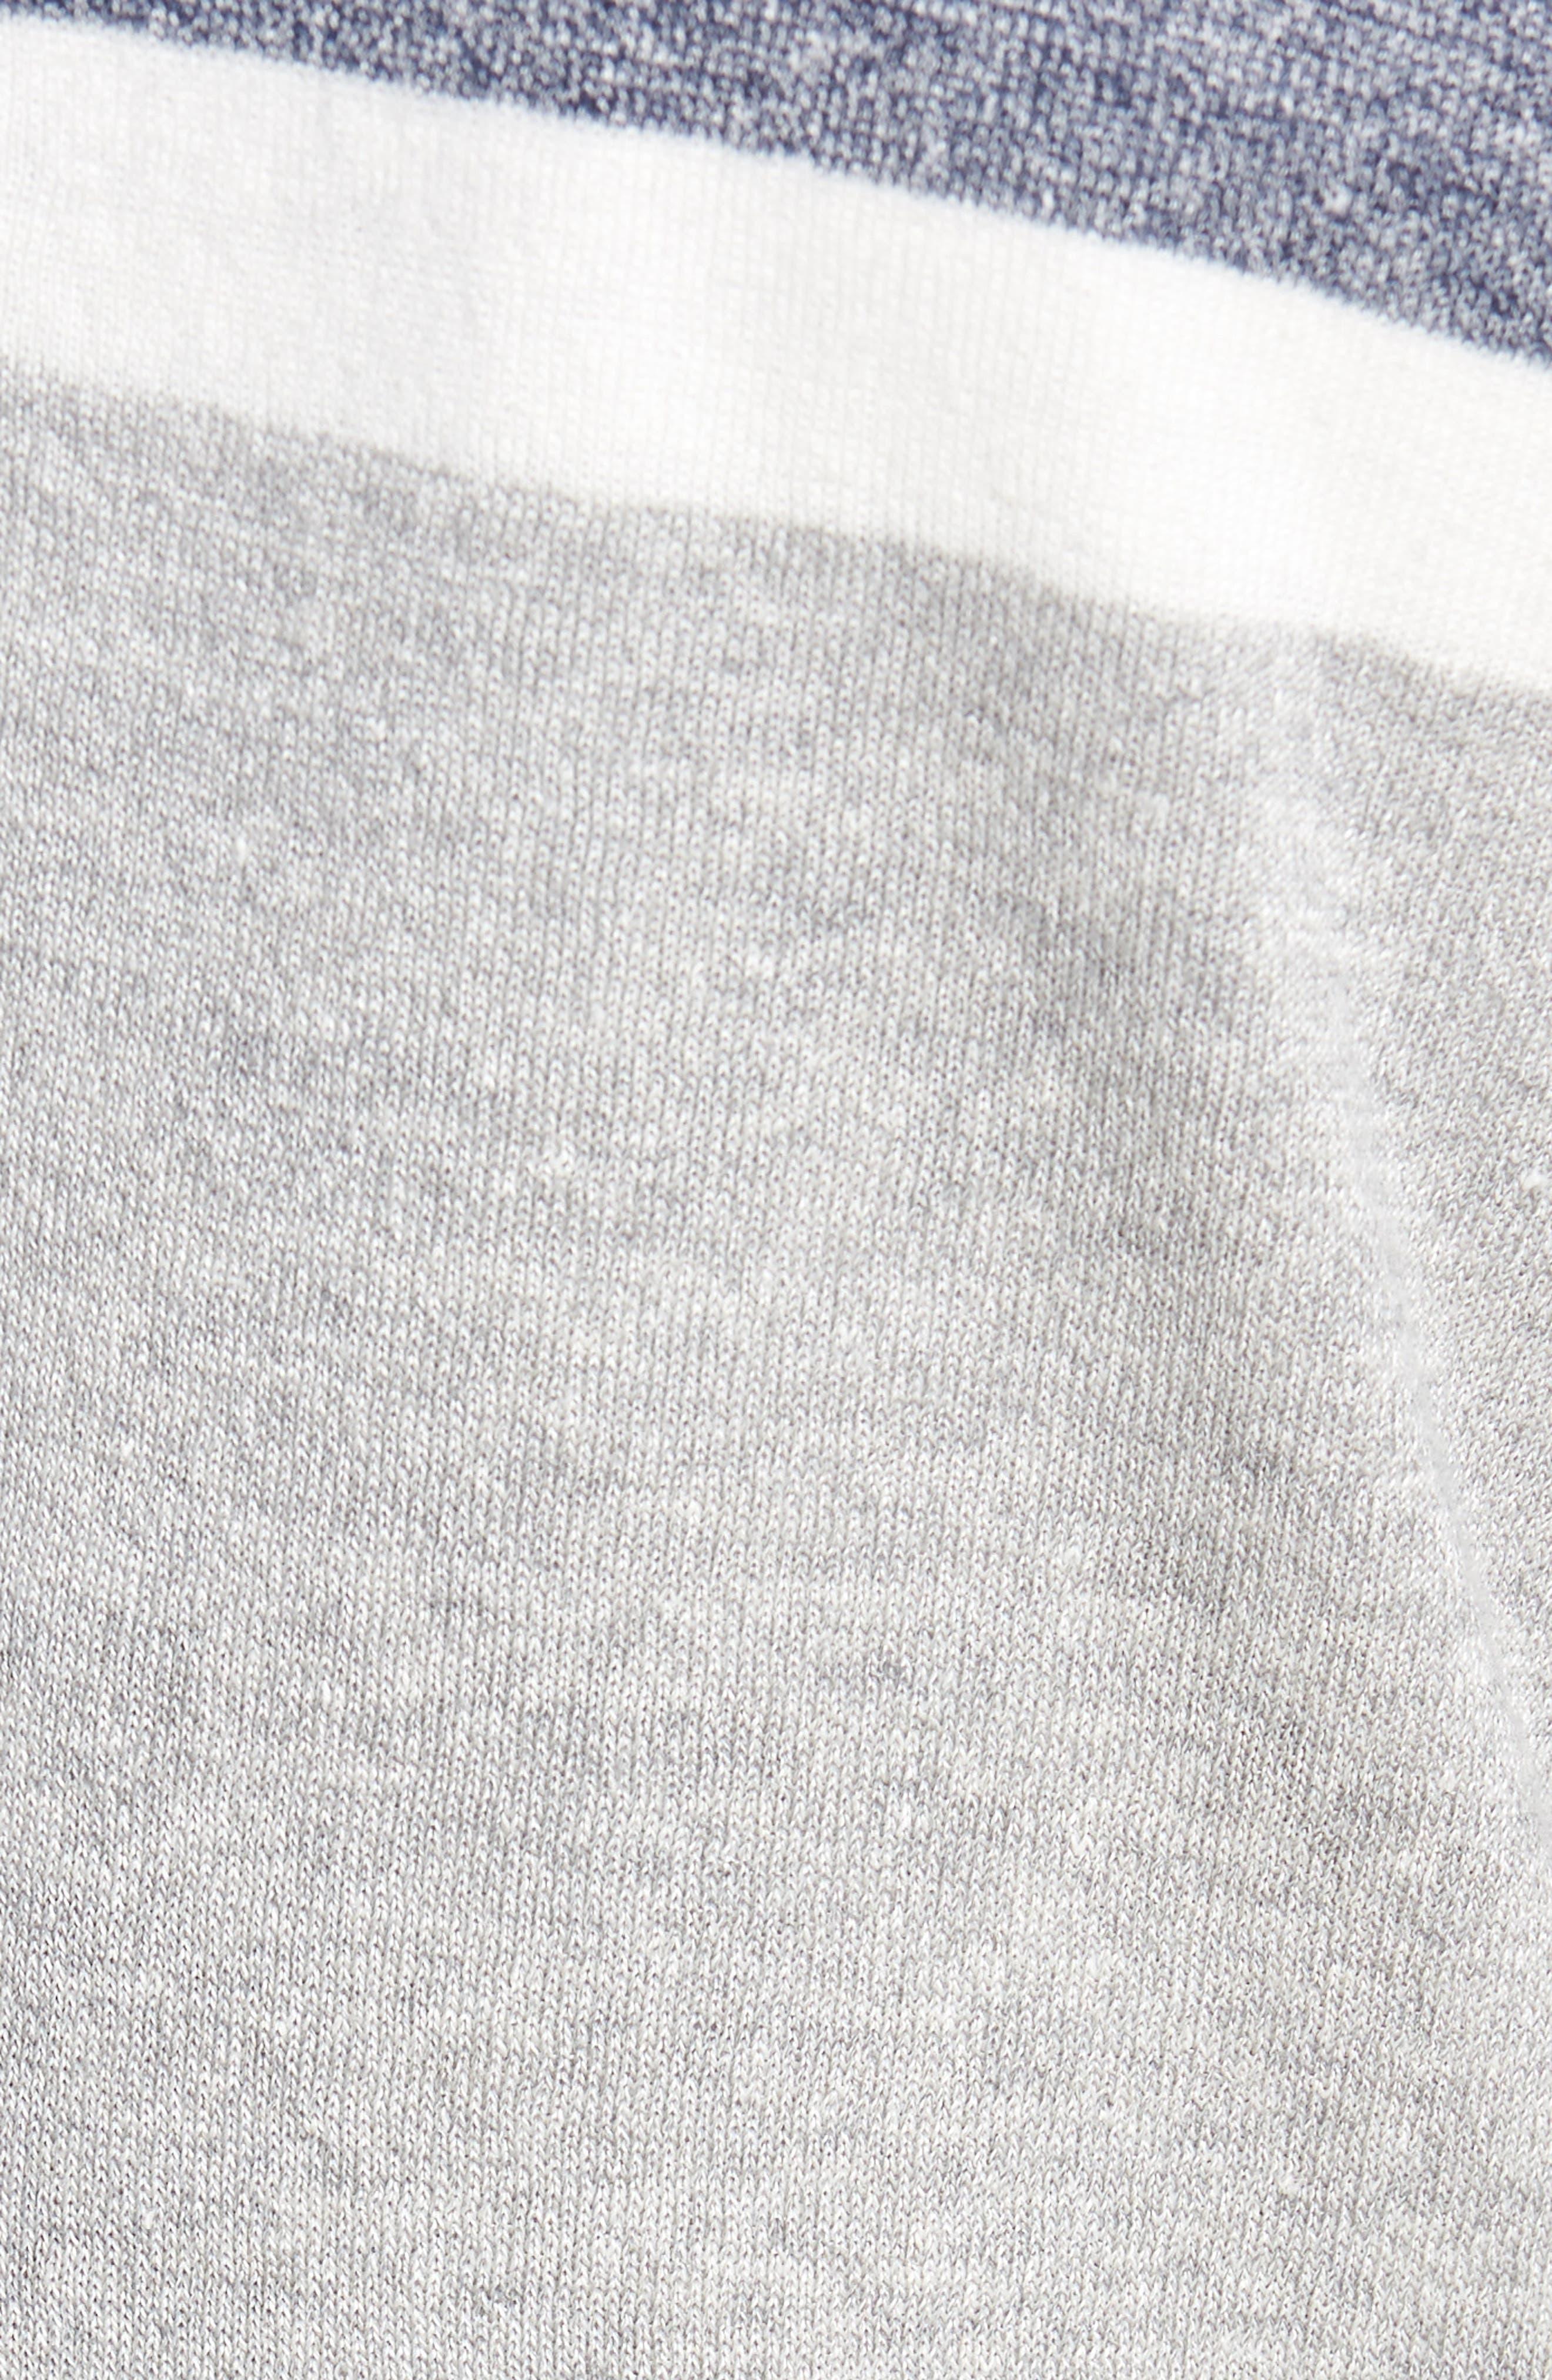 Colorblock Sweater Jacket,                             Alternate thumbnail 5, color,